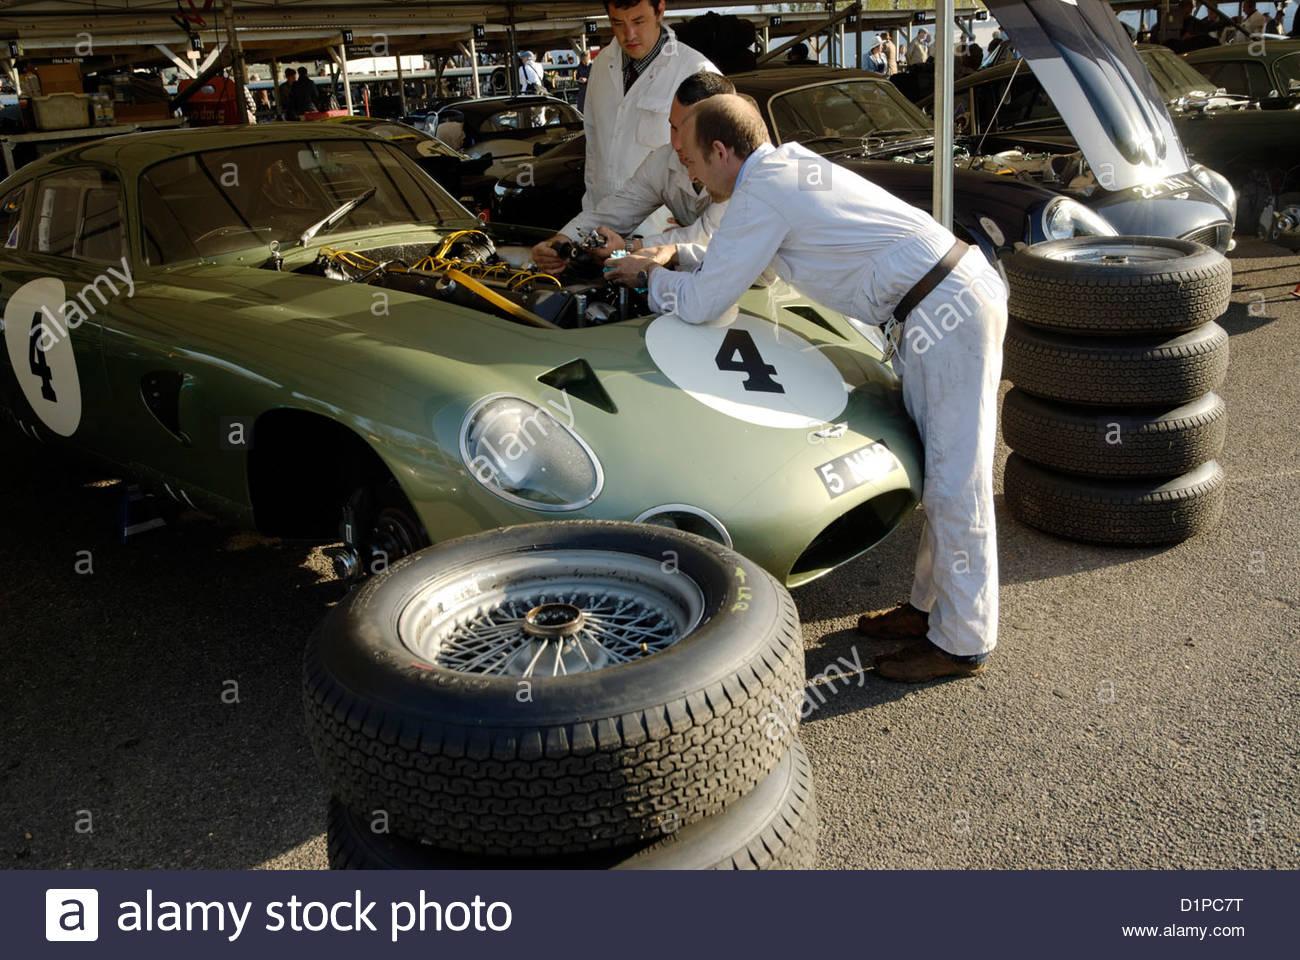 Mechaniker arbeiten am Motor die 1963 Aston Martin Projekt 214 Rennwagen-Prototypen Stockbild